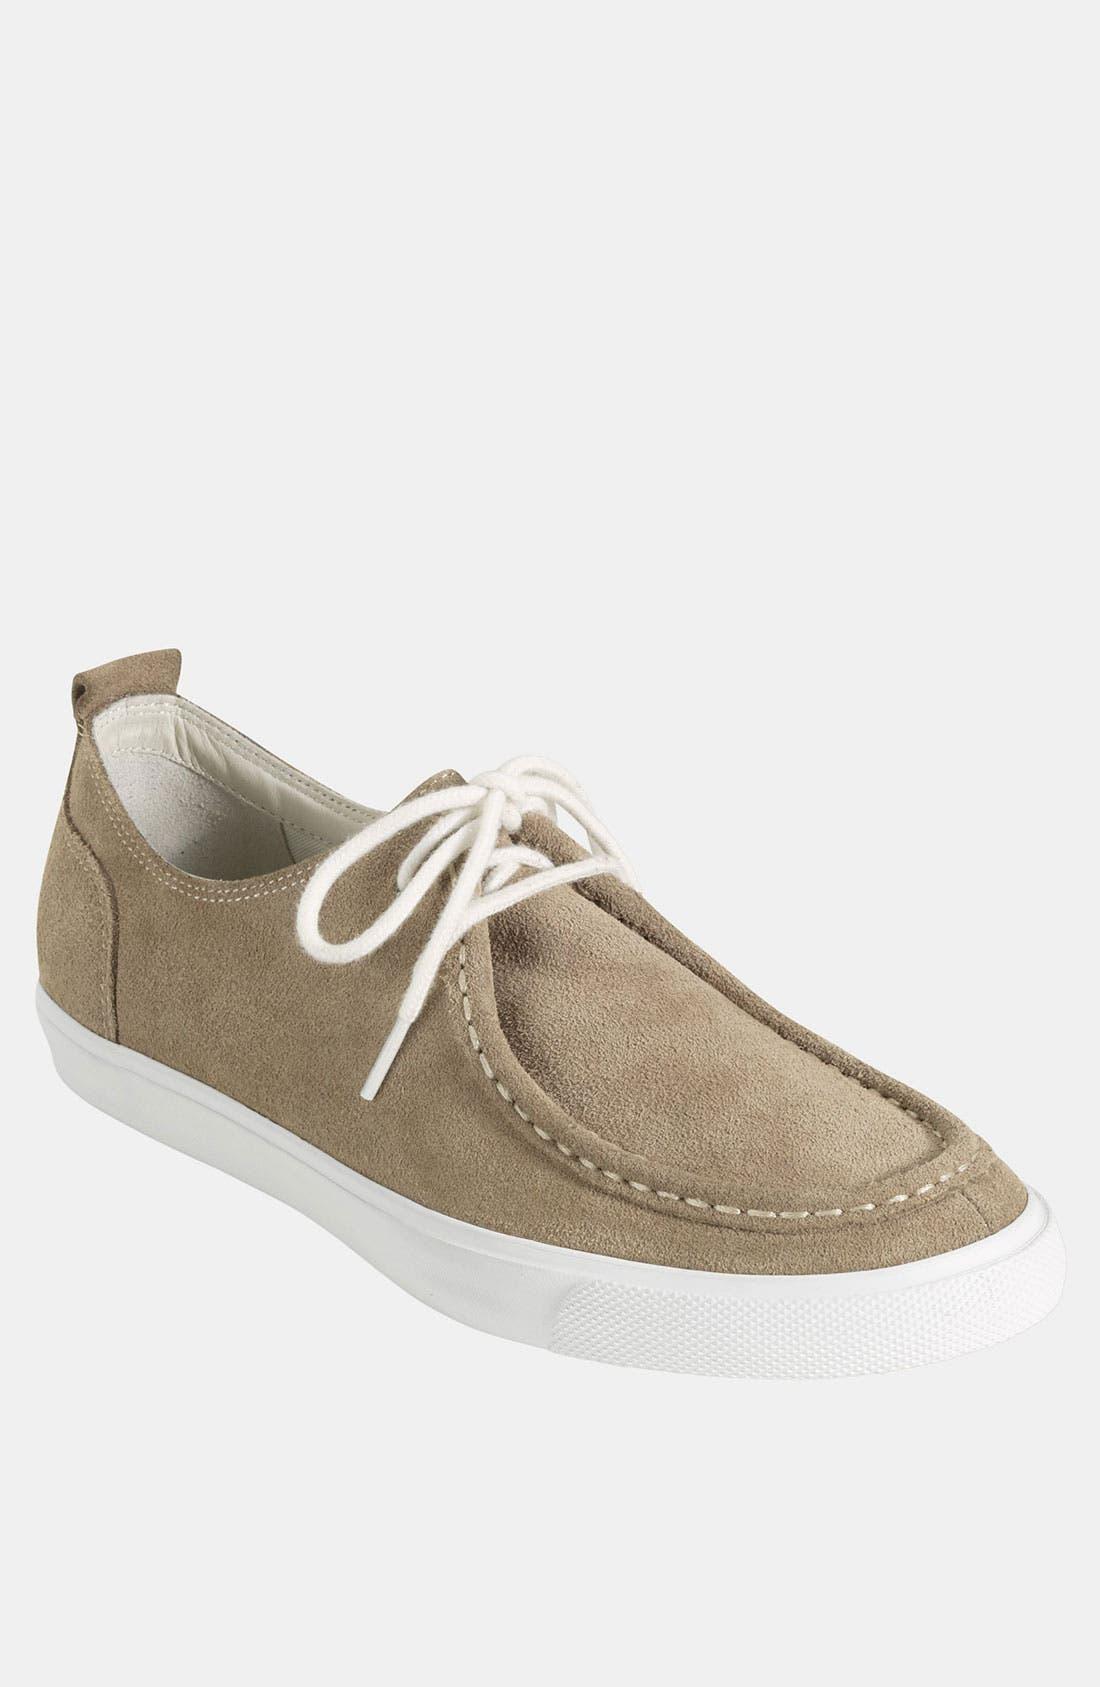 Alternate Image 1 Selected - Cole Haan 'Air Newport' Moc-Toe Sneaker